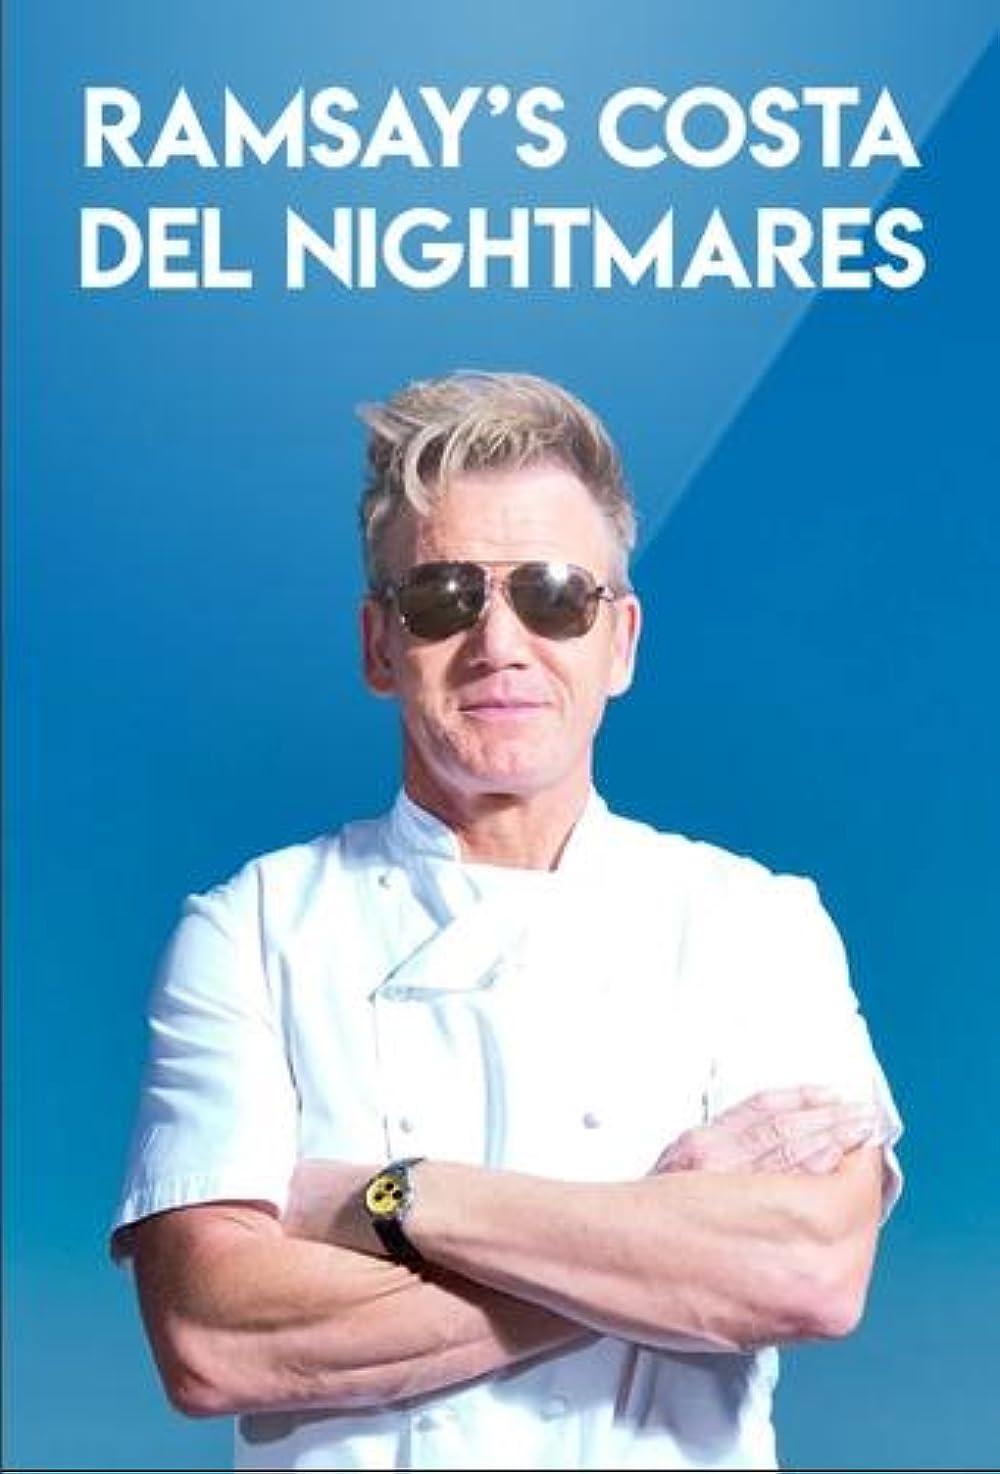 Kitchen Nightmares Full Episodes Torrent